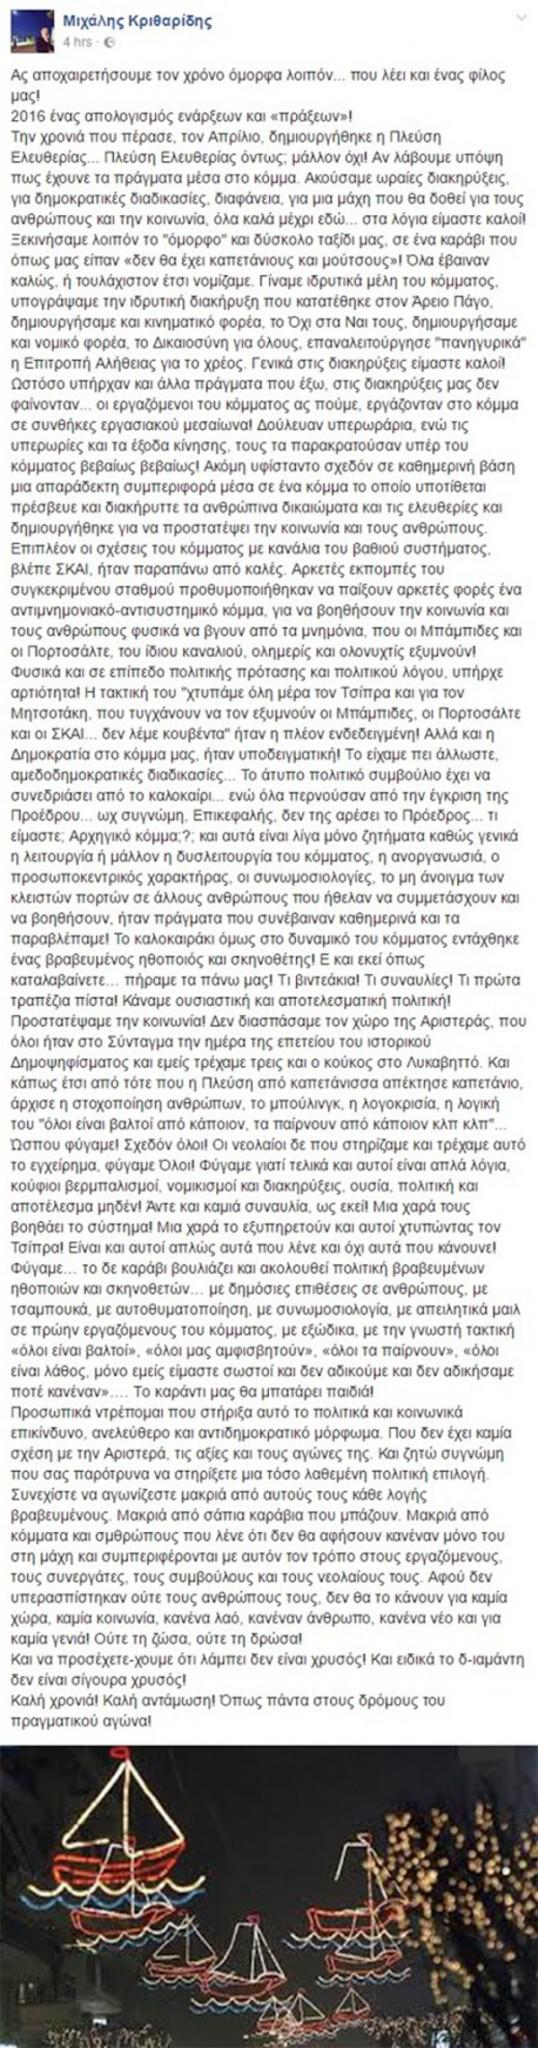 kataggelies2 Αποχωρούν με βαριές καταγγελίες μέλη της νεολαίας του κόμματος της Κωνσταντοπούλου